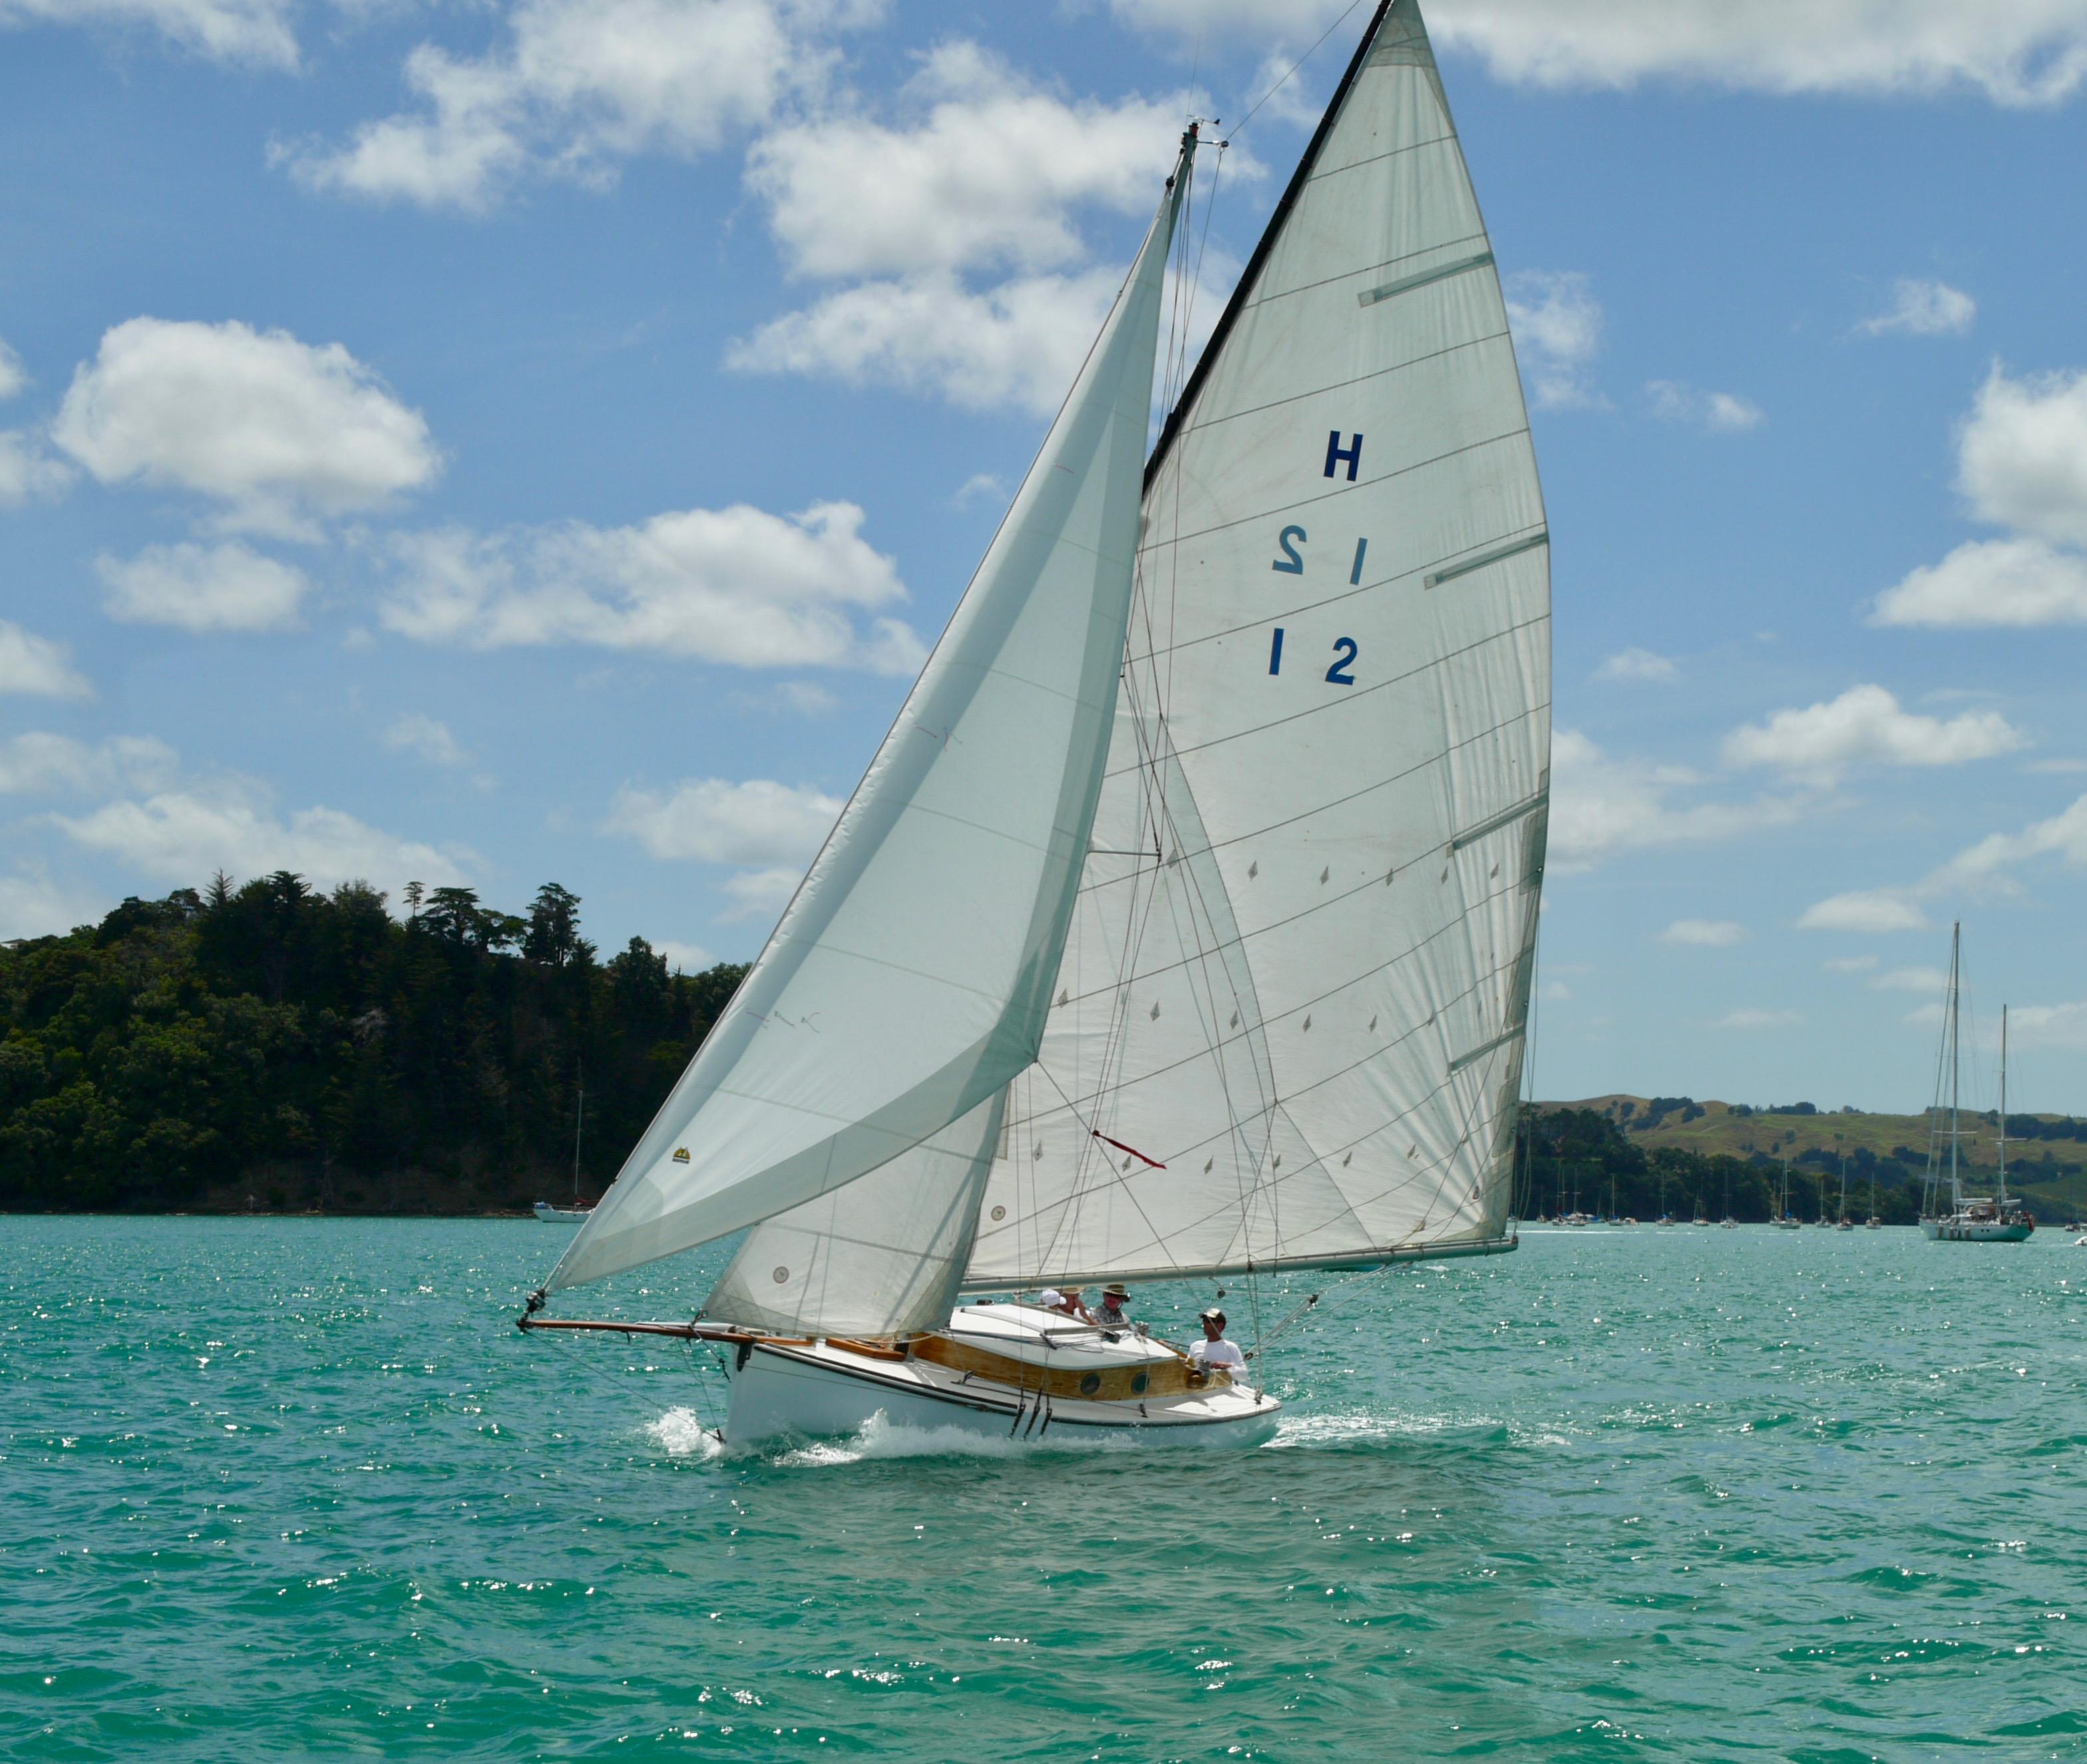 MAHURANGI REGATTA 2019 – The biggest & best classic wooden boat regatta in NZ – 90+ photos